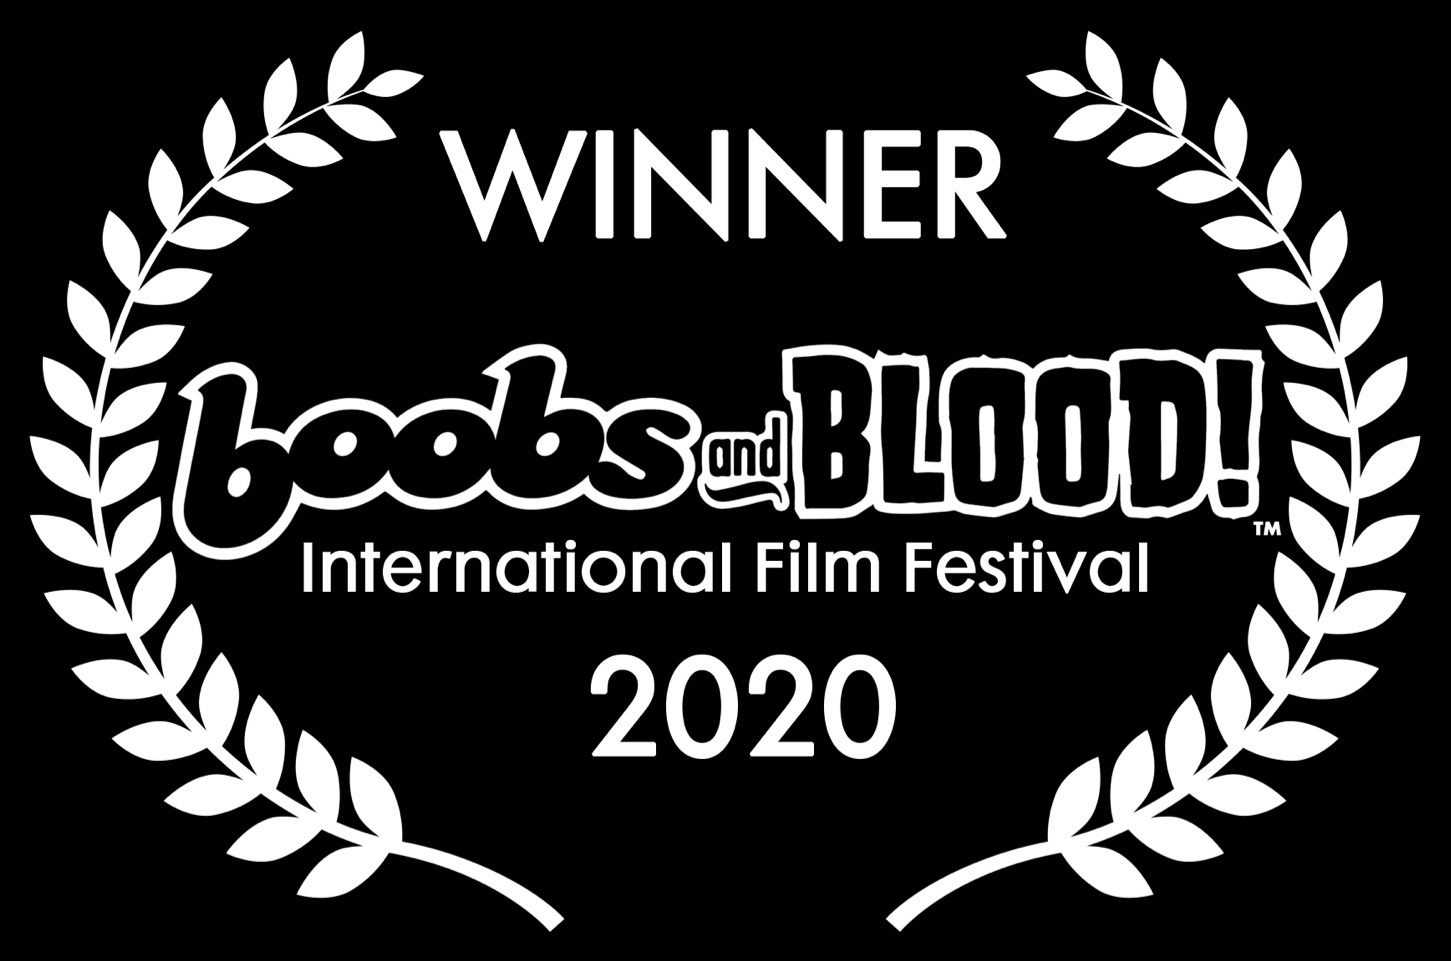 Boobs and Blood Award